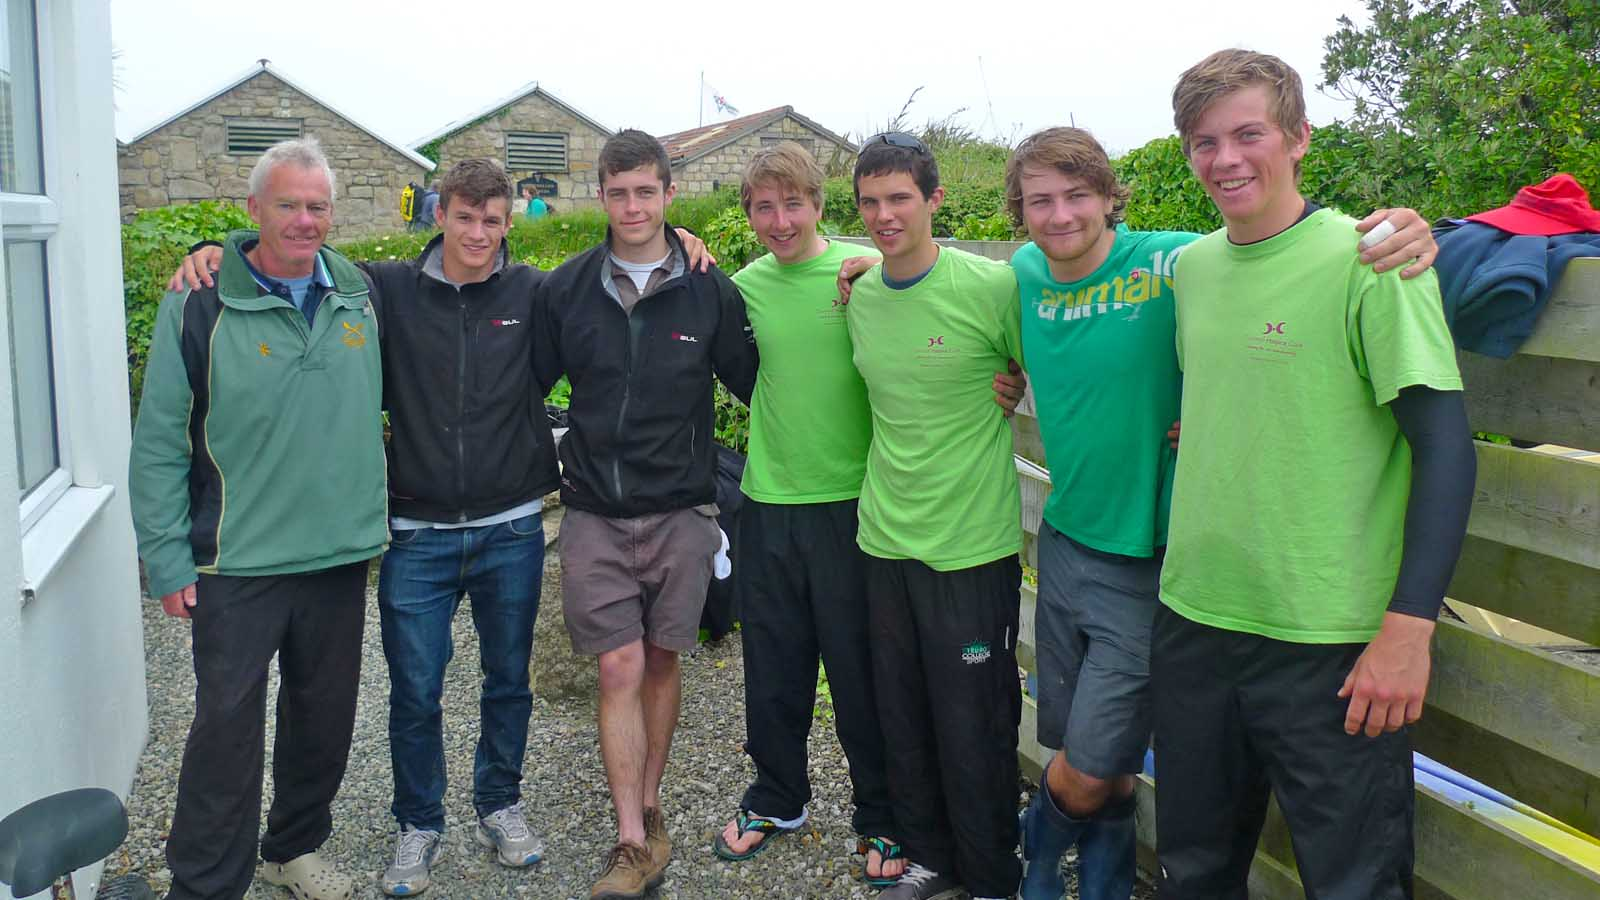 helford gig crew scilly row 2012